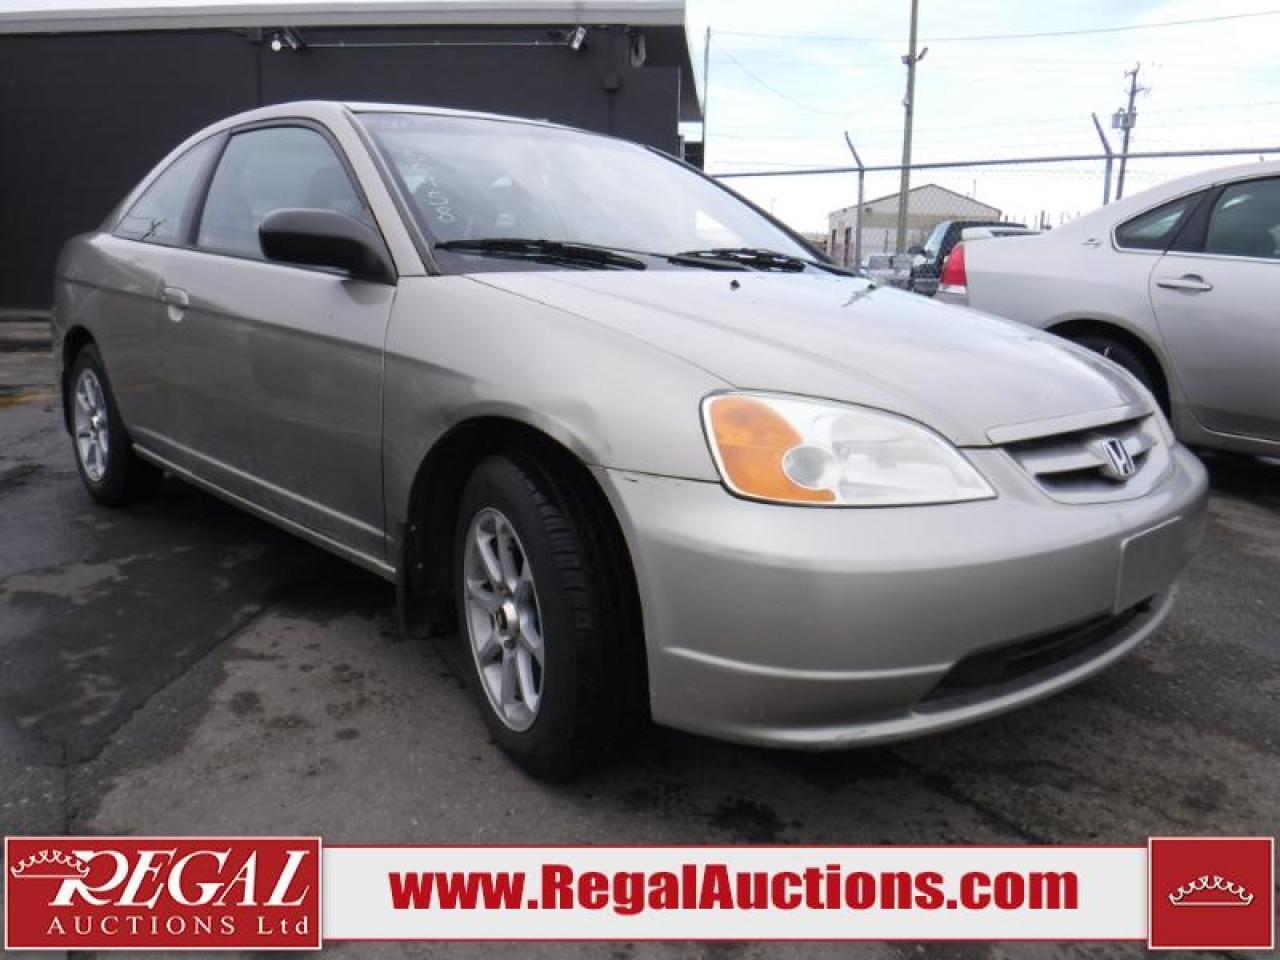 Photo of Grey 2003 Honda Civic